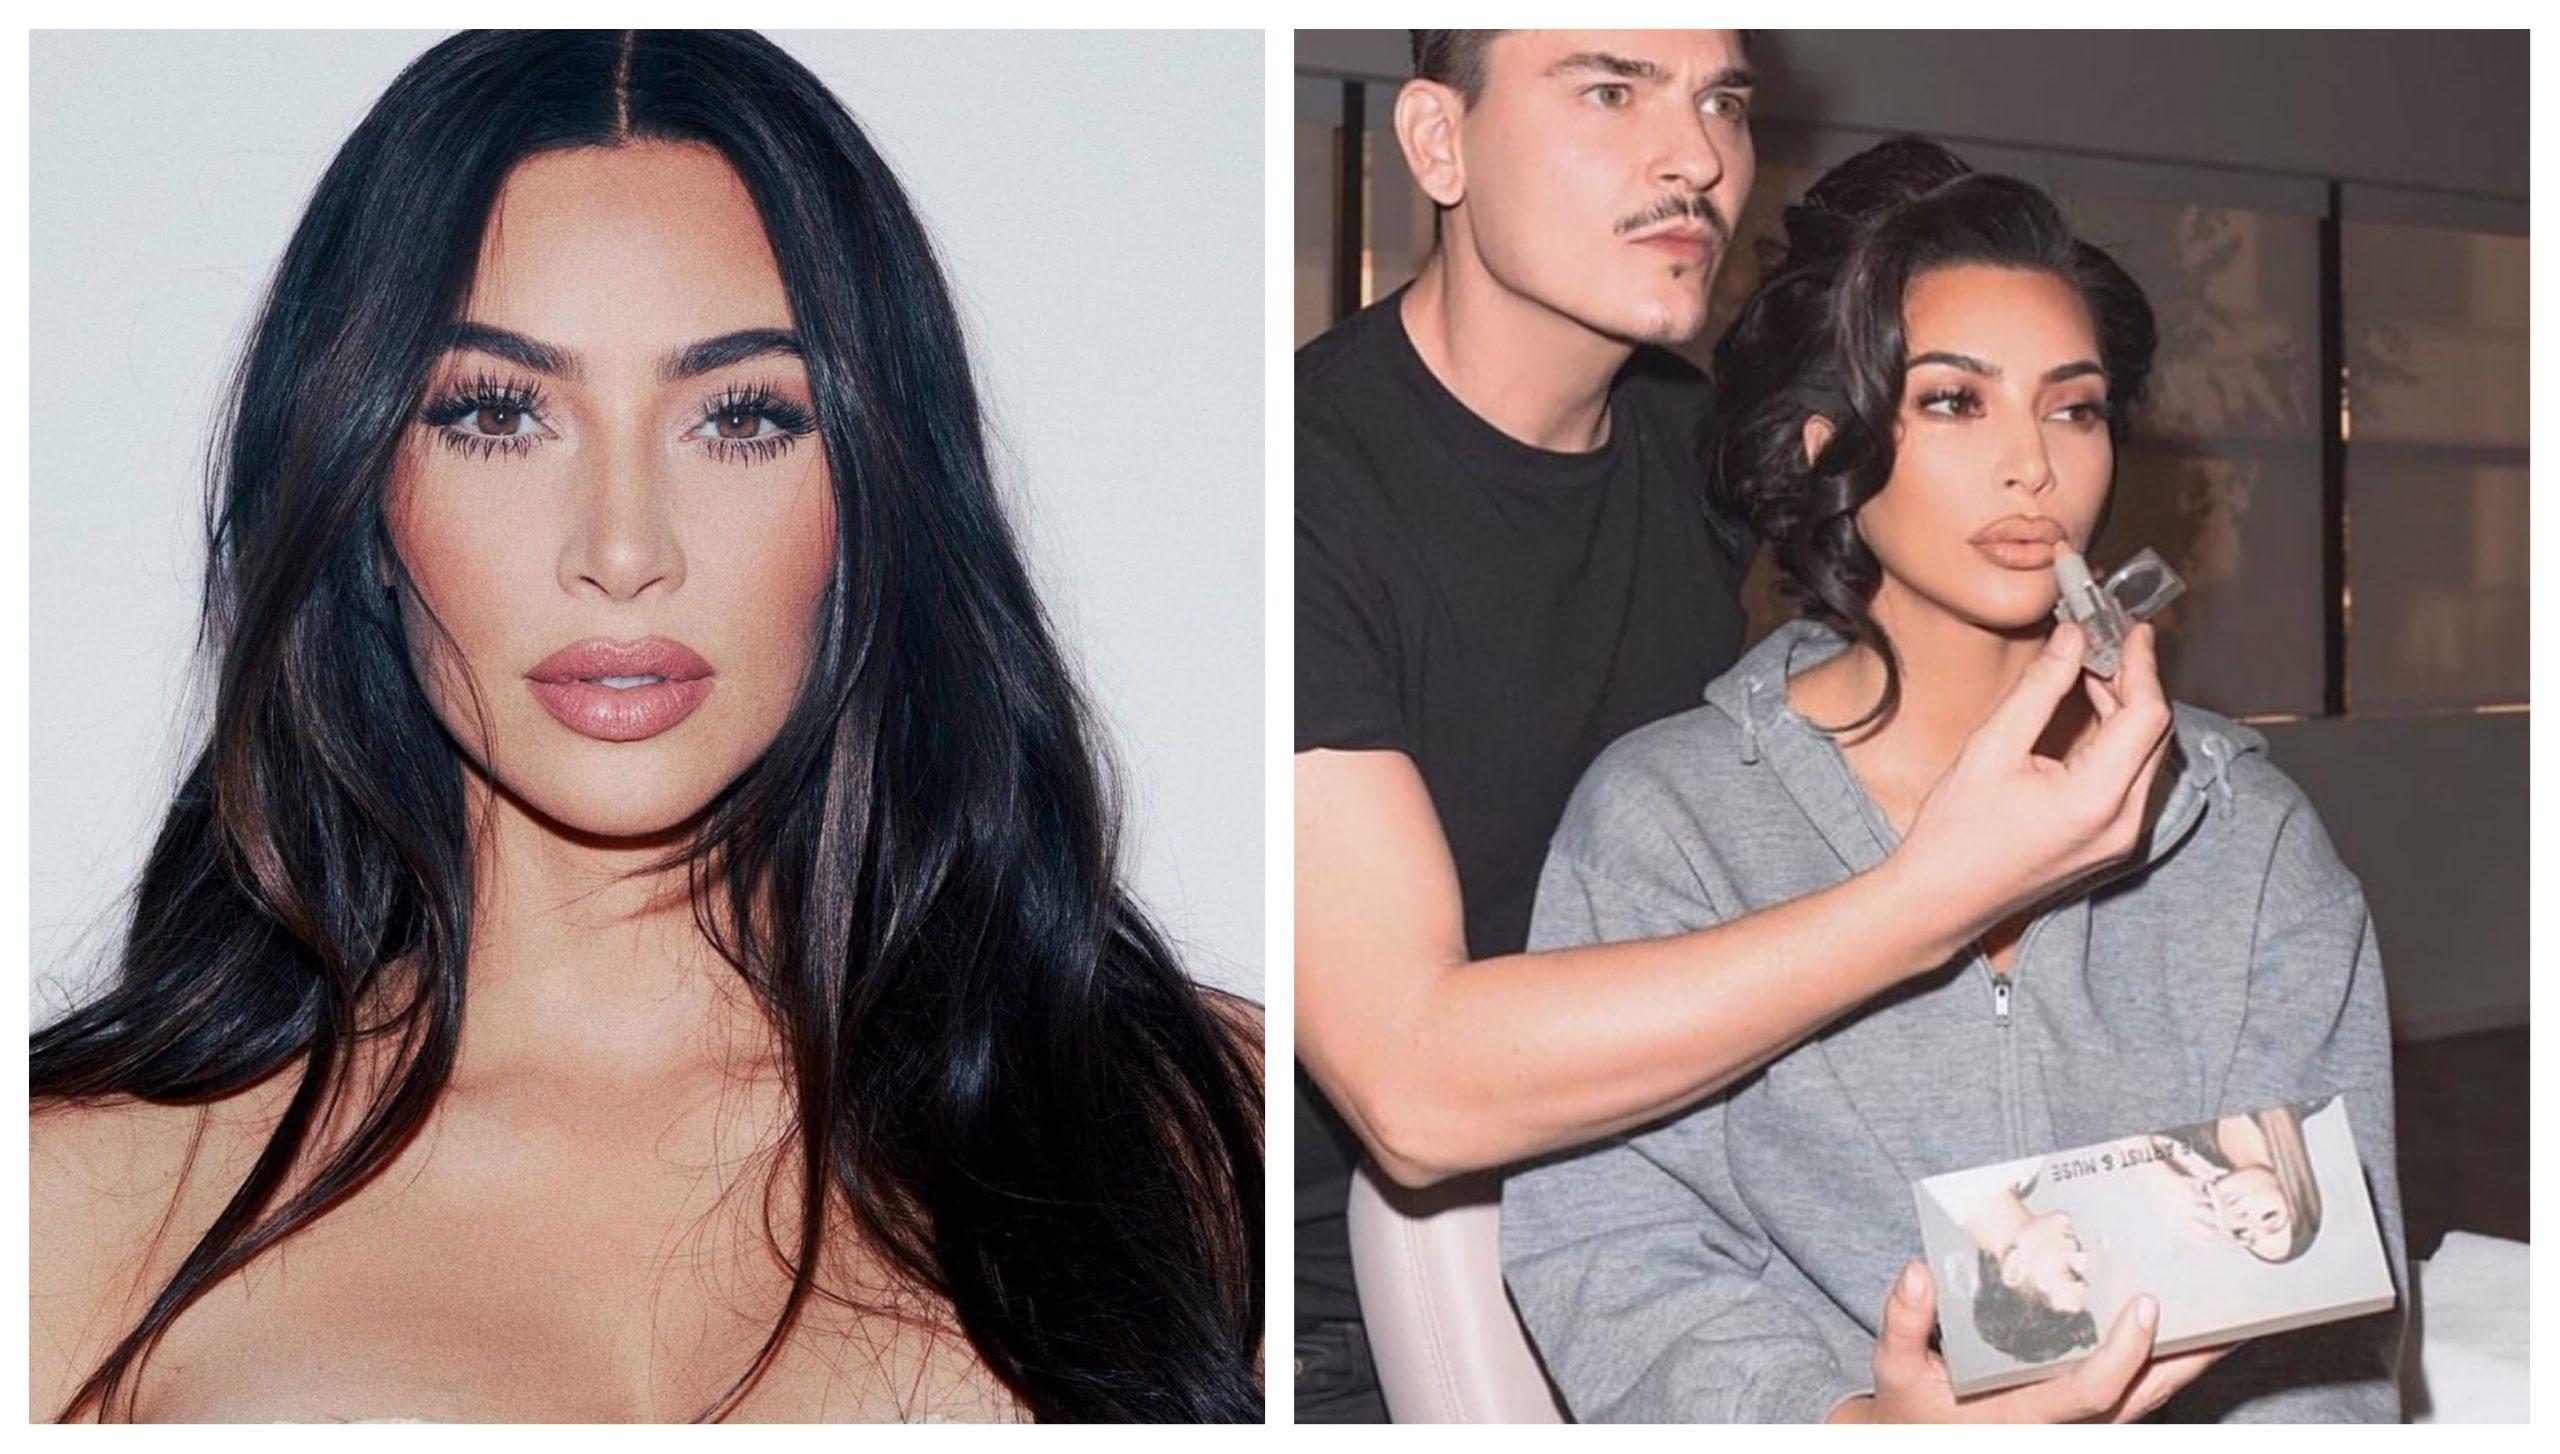 FOTO: IG@Kim Kardashian&Makeup by Mario